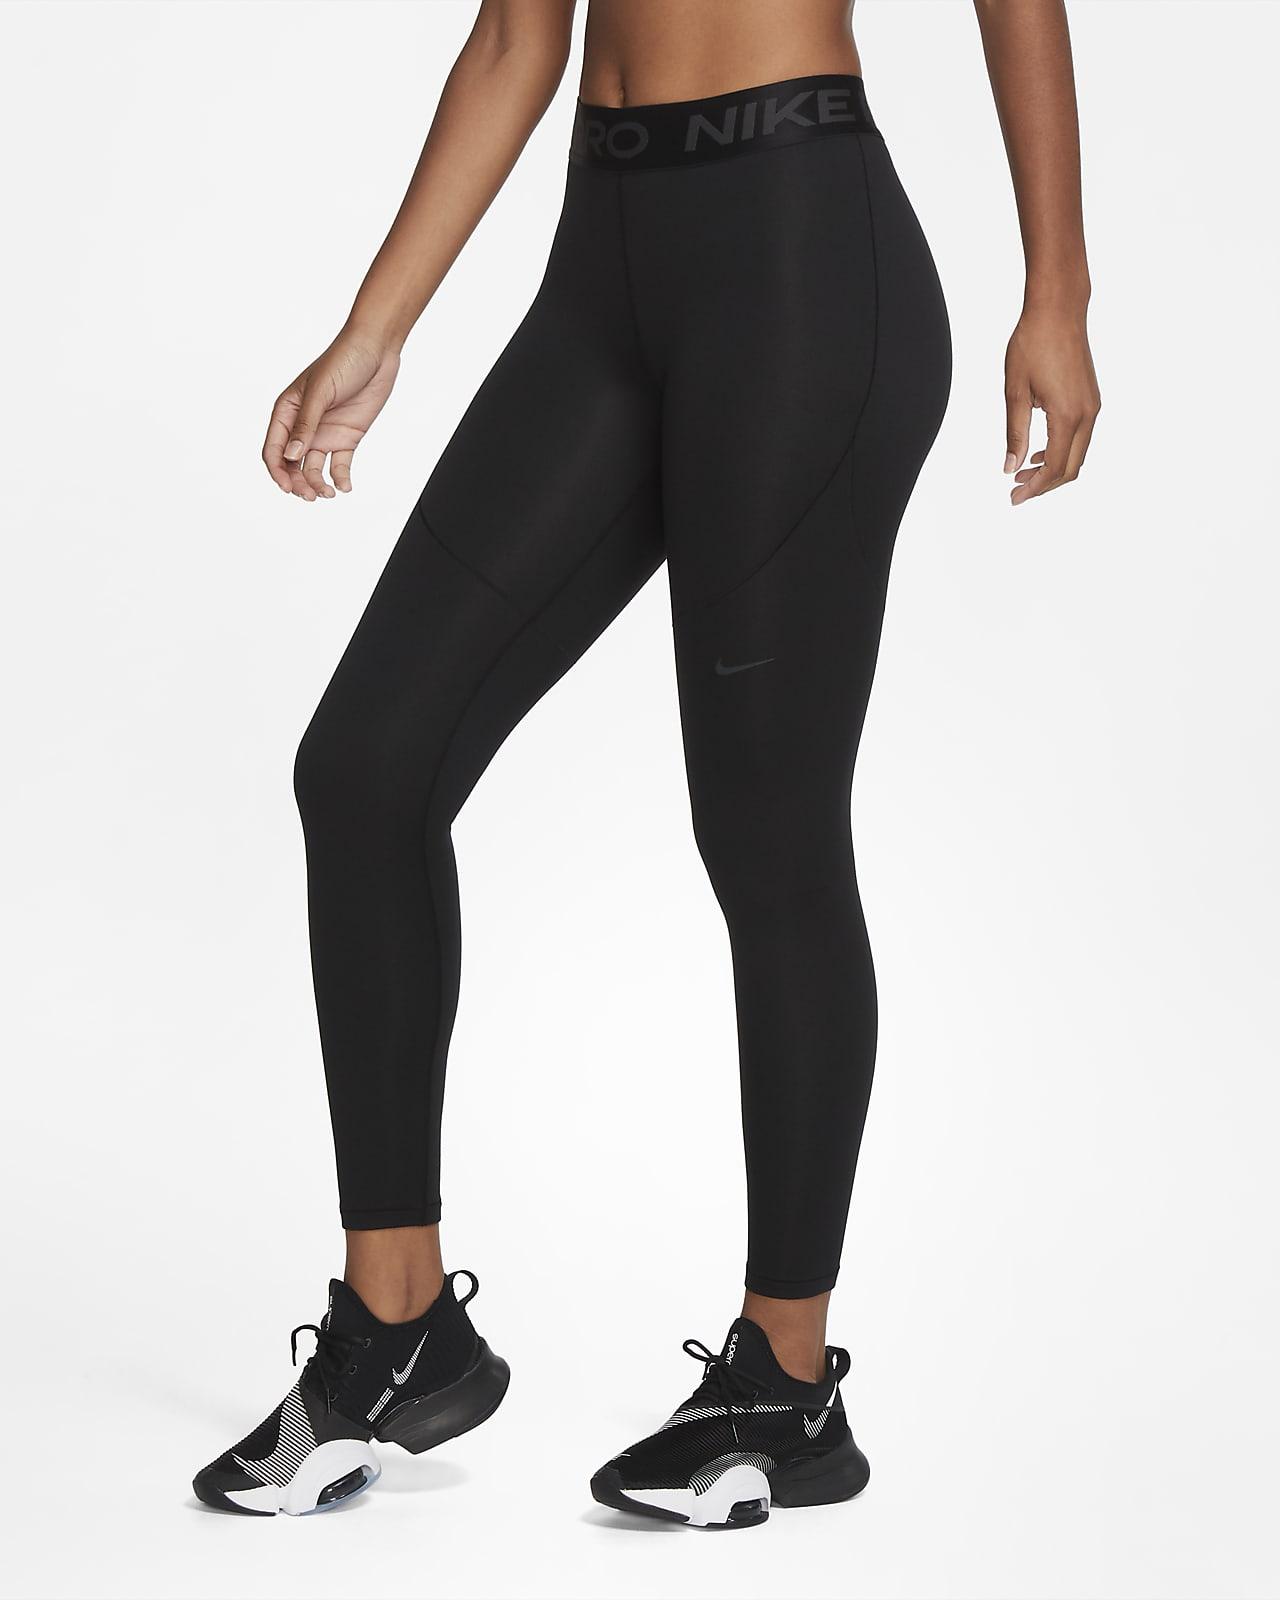 Nike Pro Thema Women's Leggings